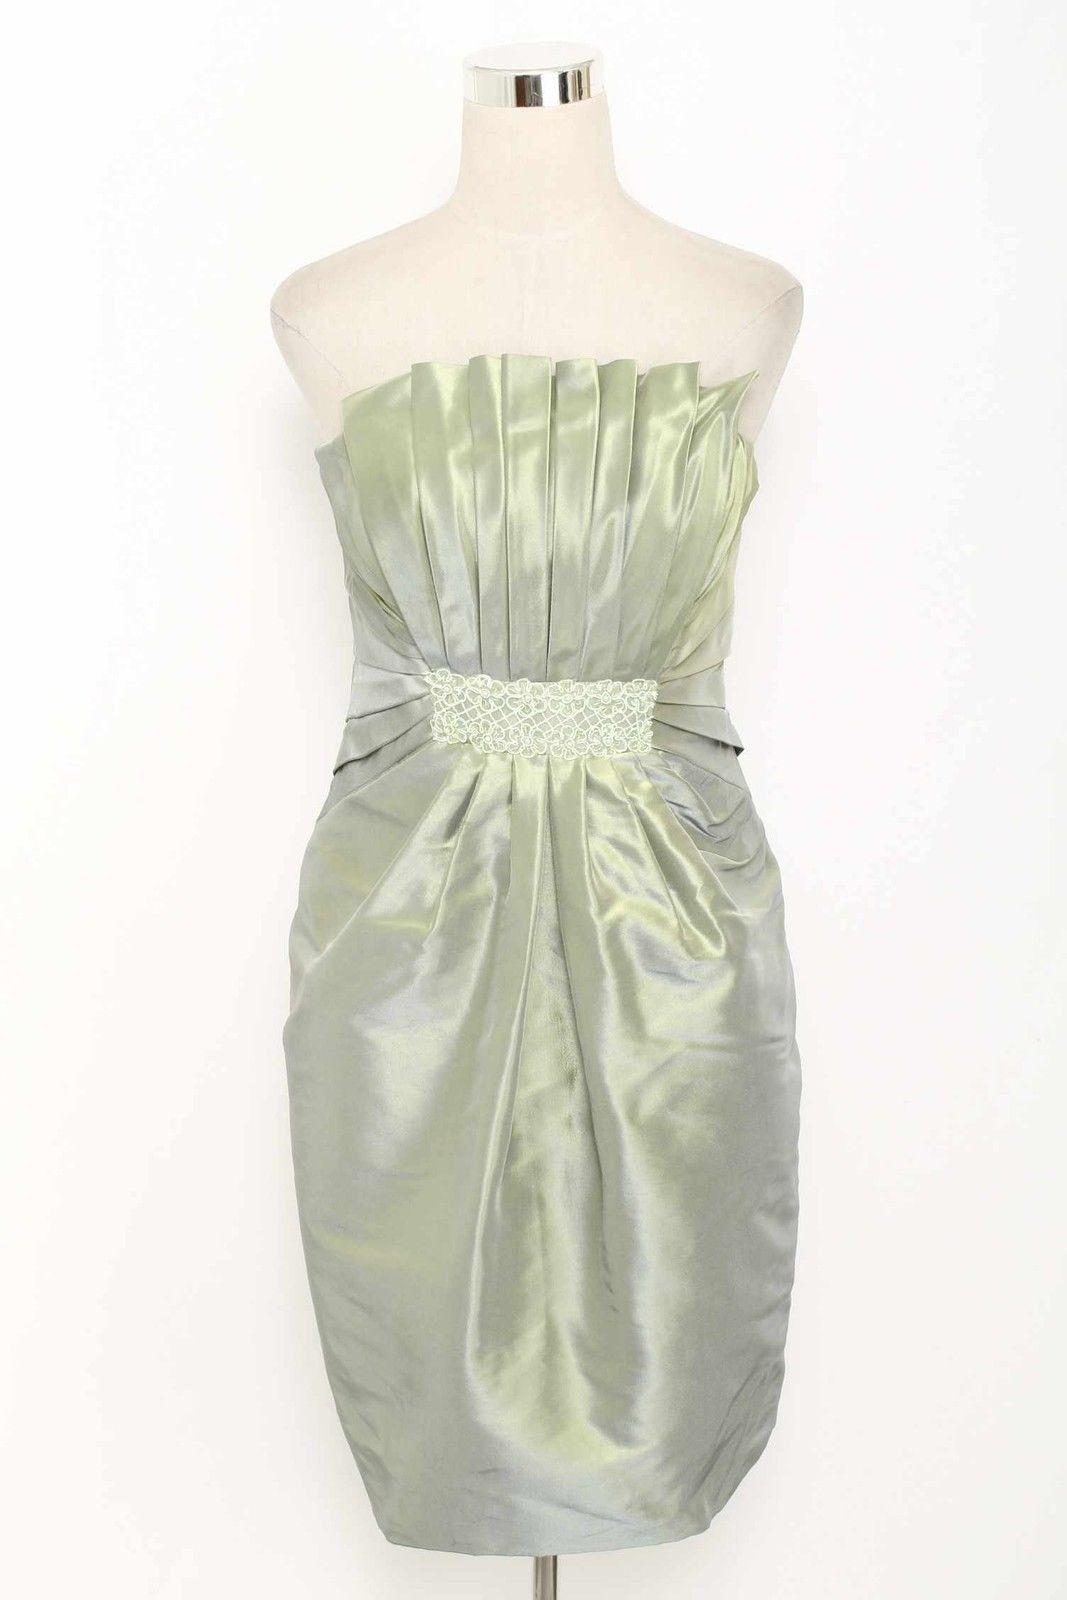 Badgley Mischka Iridescent Green Taffeta Pleated Dress Size 12 1511 T1115